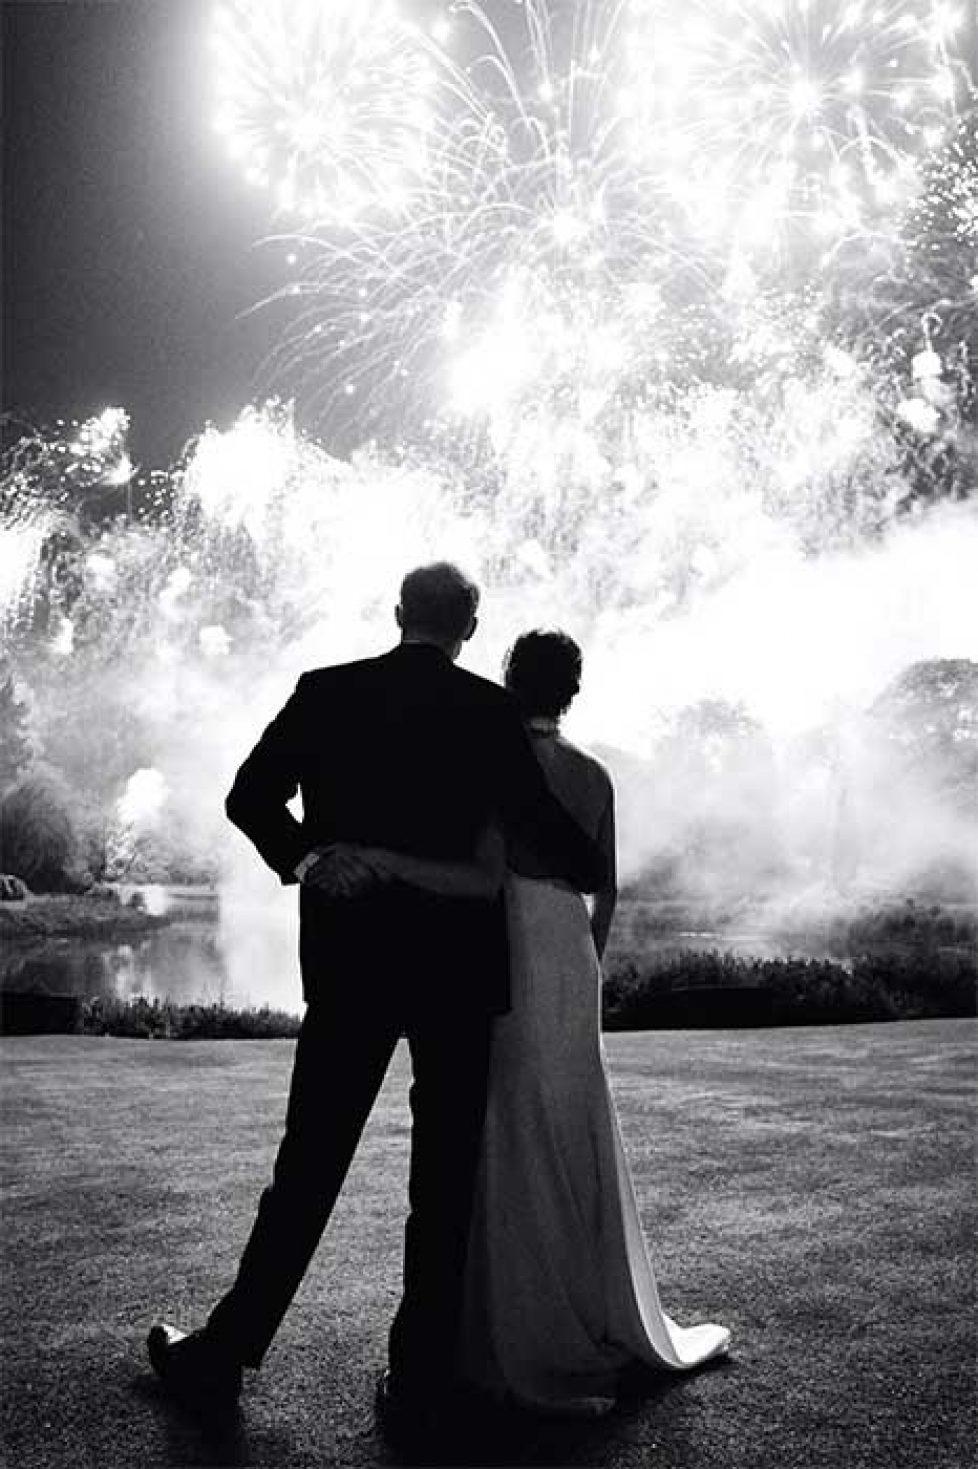 Prince-Harry-and-Meghan-wedding-fireworks-xmas-card-z